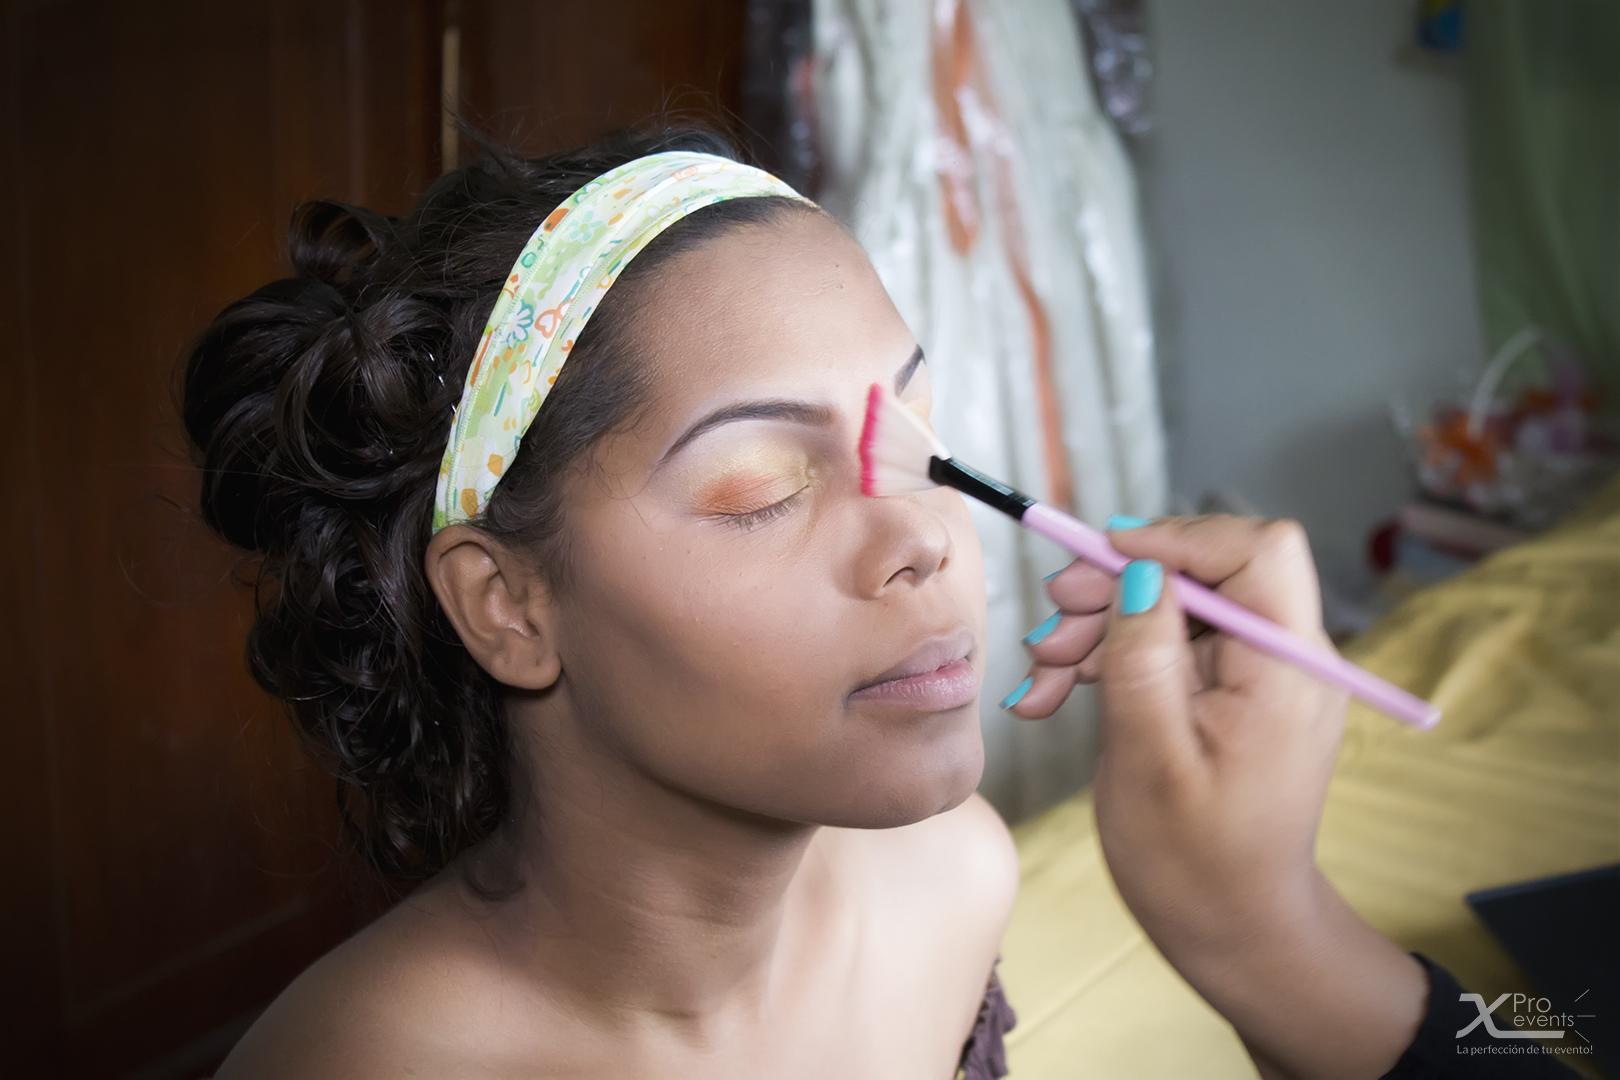 www.Xproevents.com - Maquillaje de novia Belfany.jpg